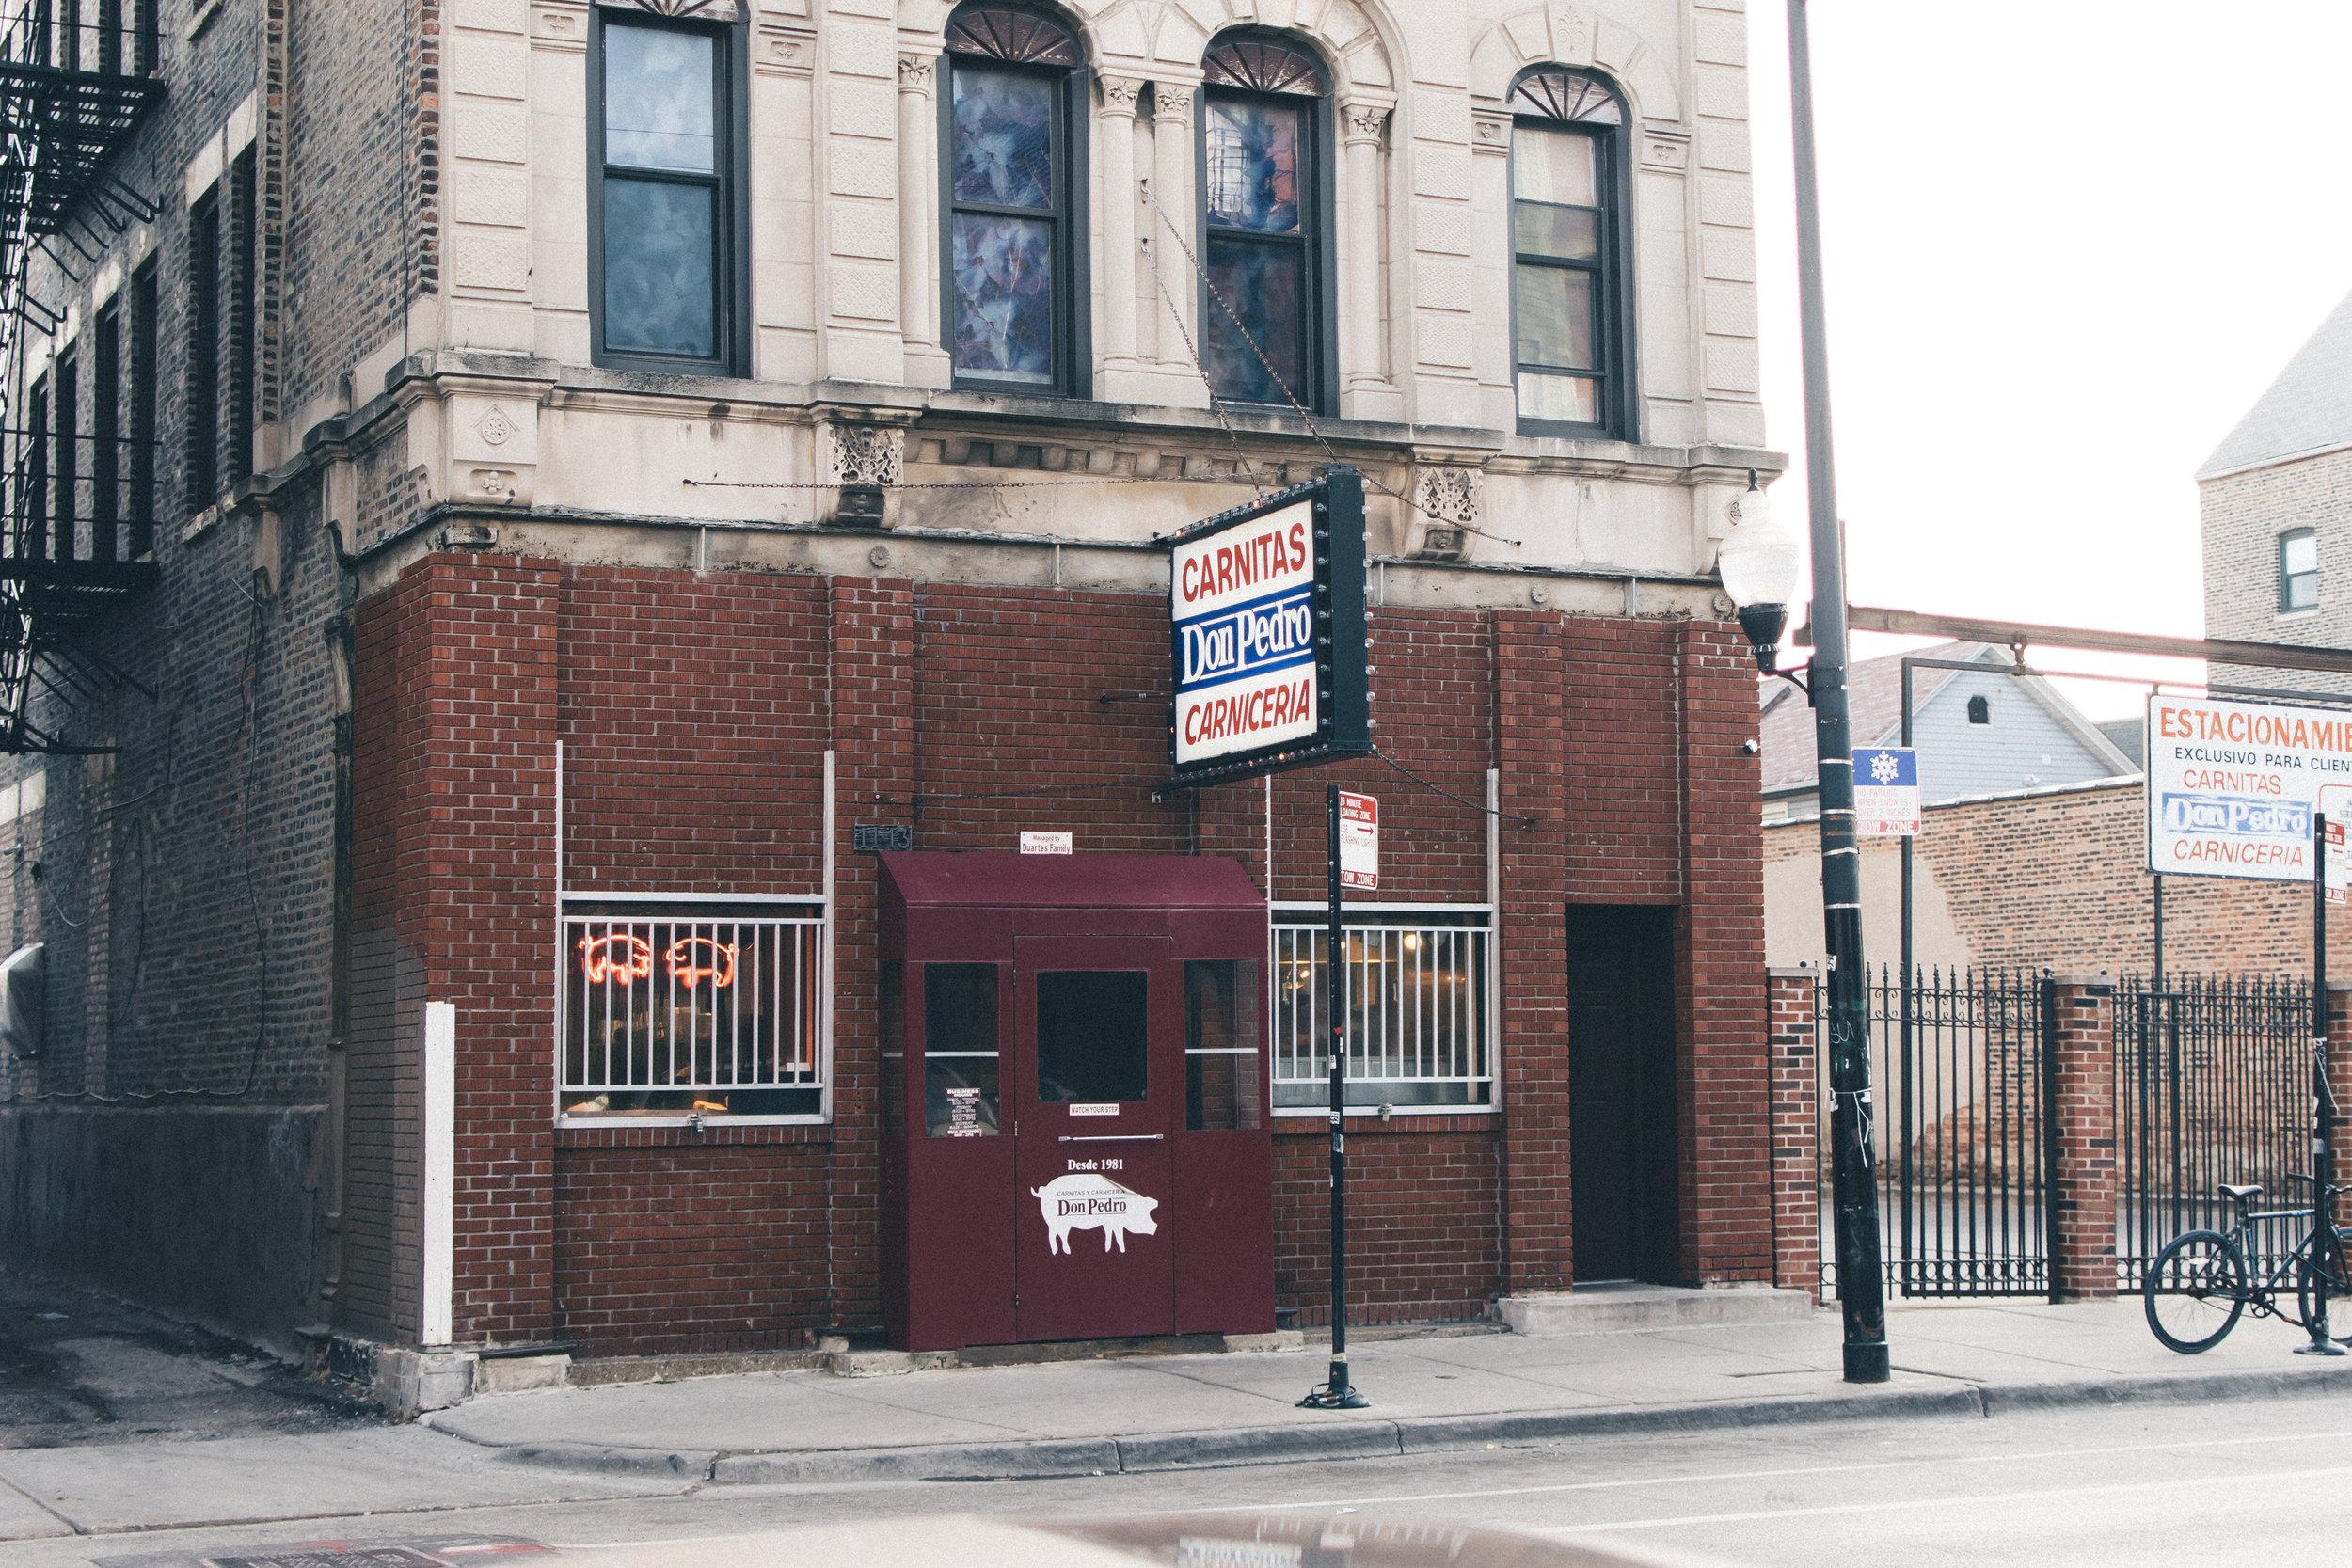 Kyle Studstill_Composure_Pilsen_Chicago-11.jpg